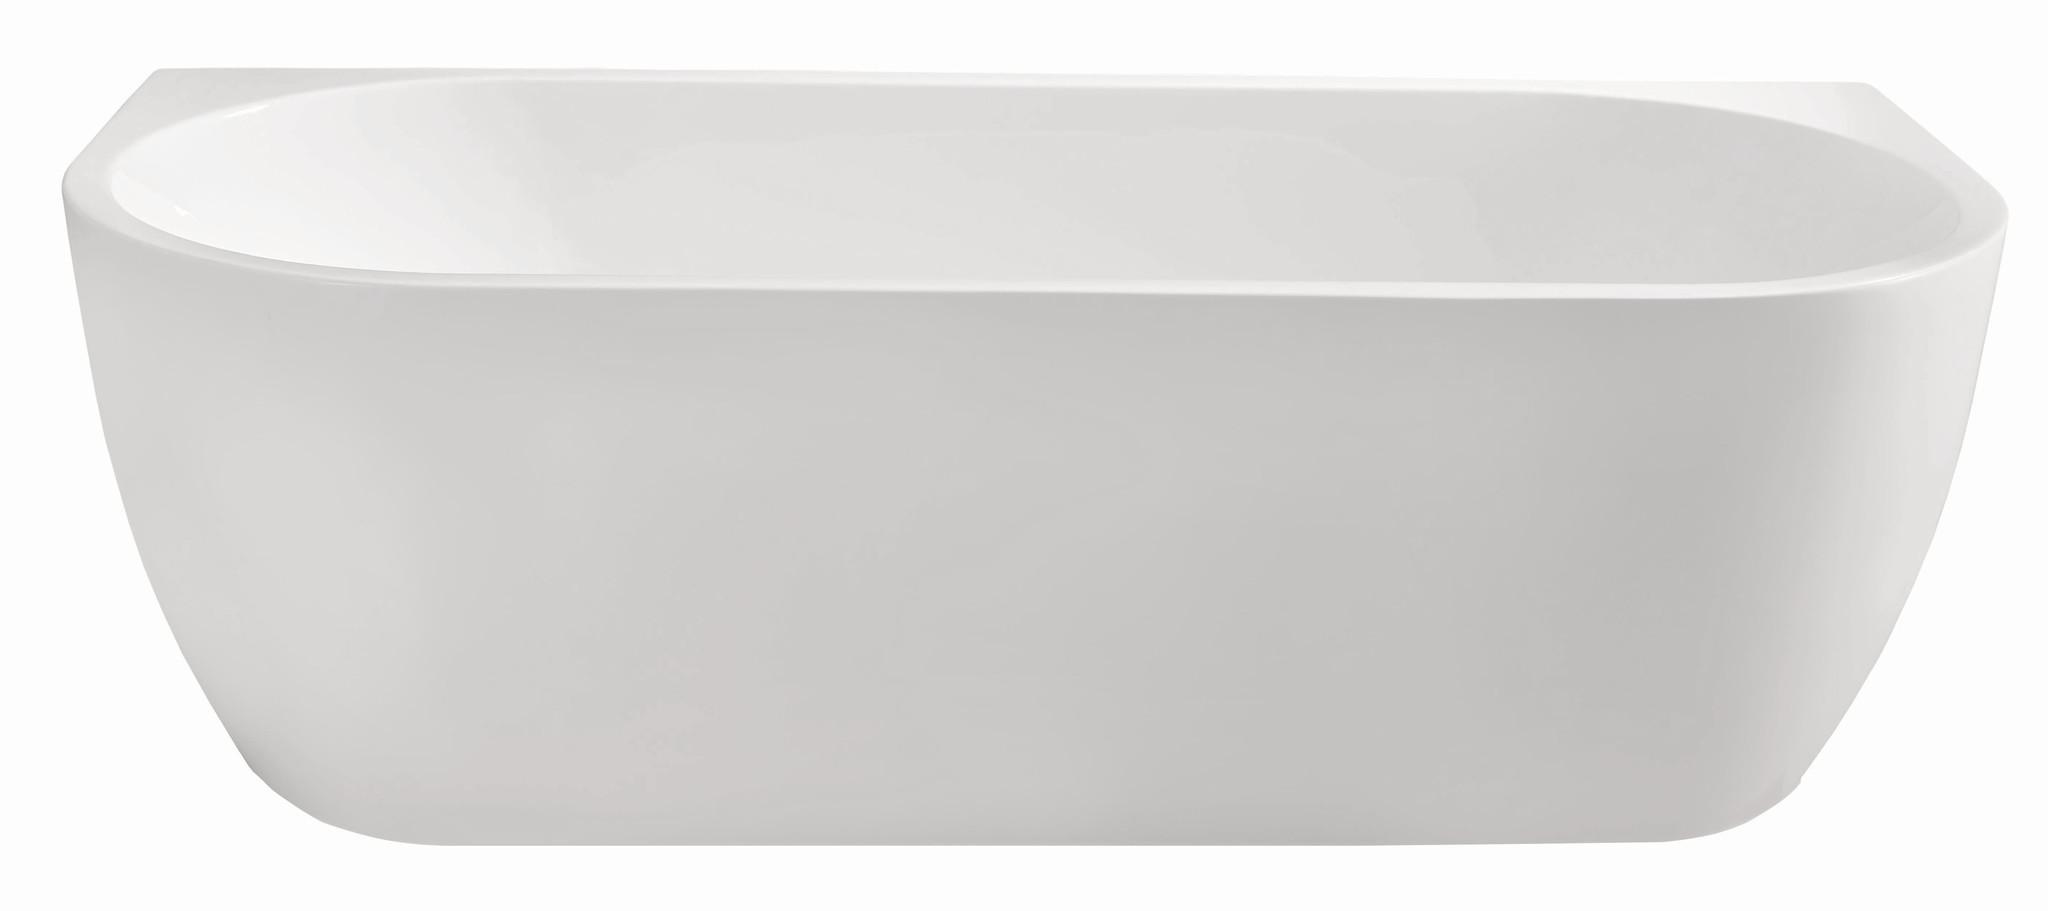 Wiesbaden Wall half-vrijstaand acryl ligbad 170x75 wit